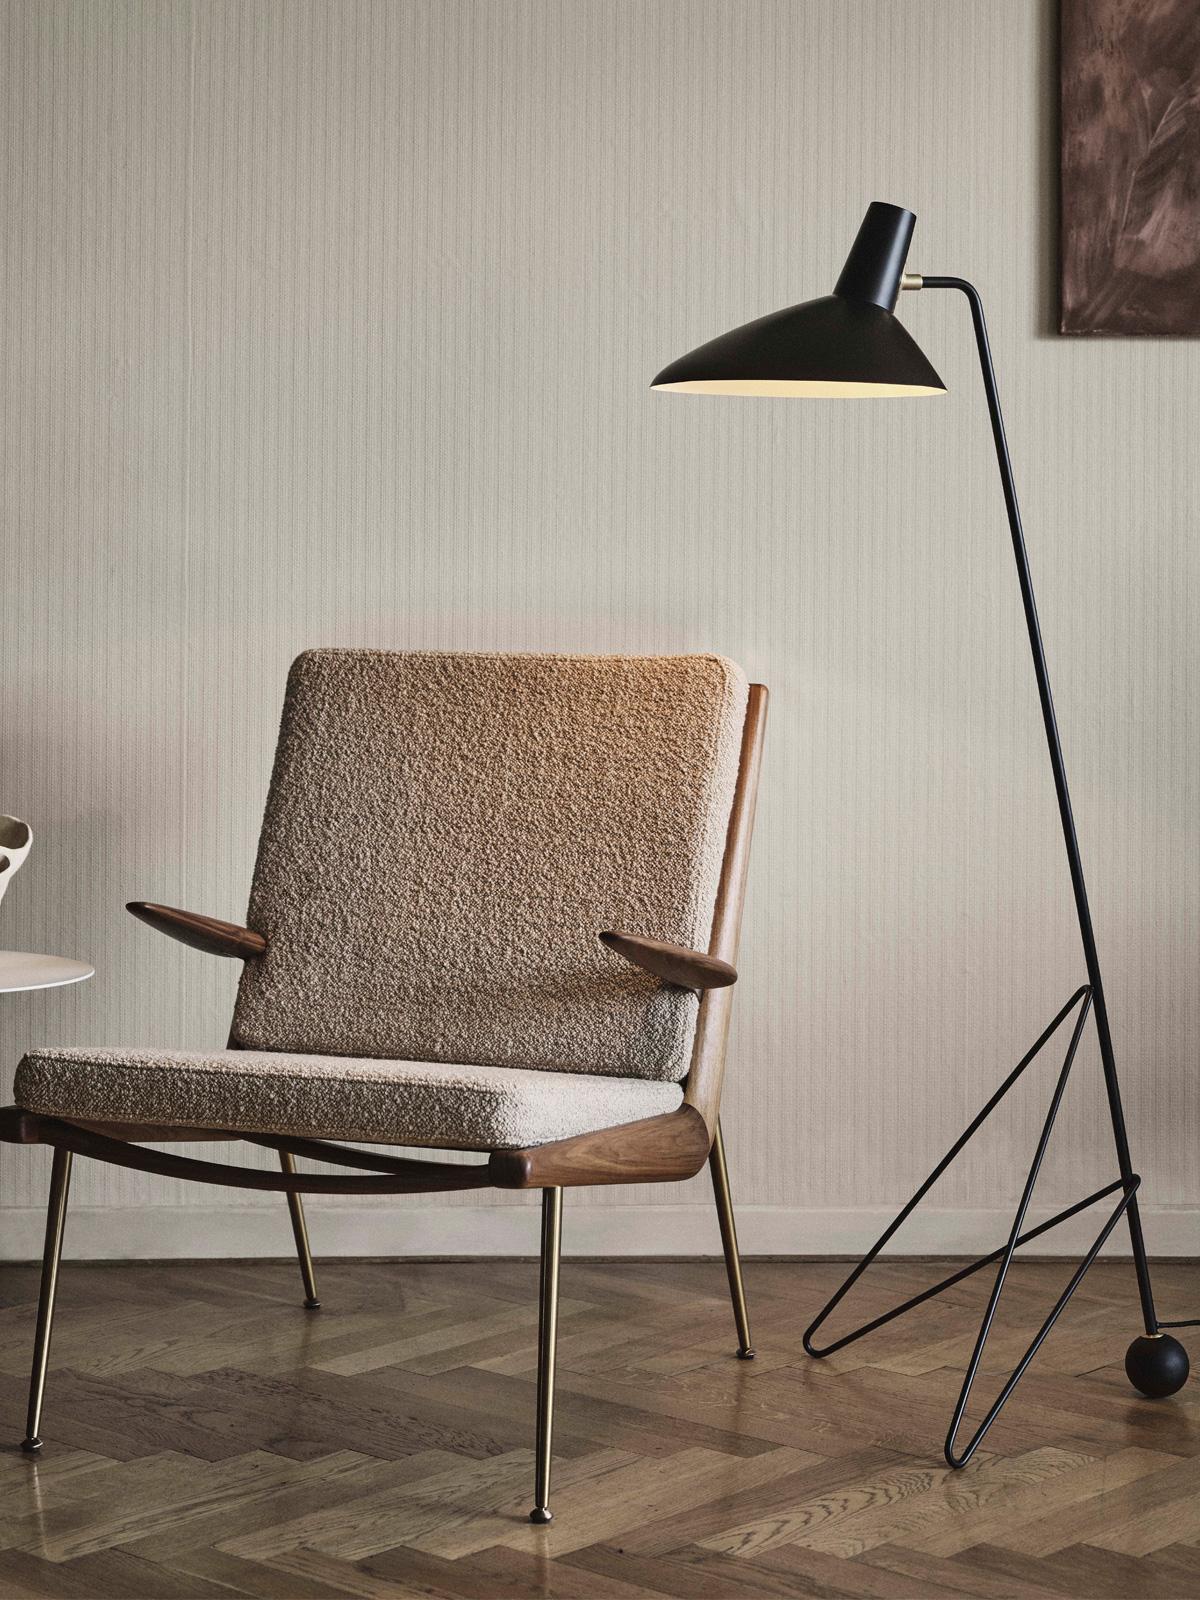 DesignOrt Blog: Tripod HM8 &tradition DesignOrt Onlineshop Lampen Berlin